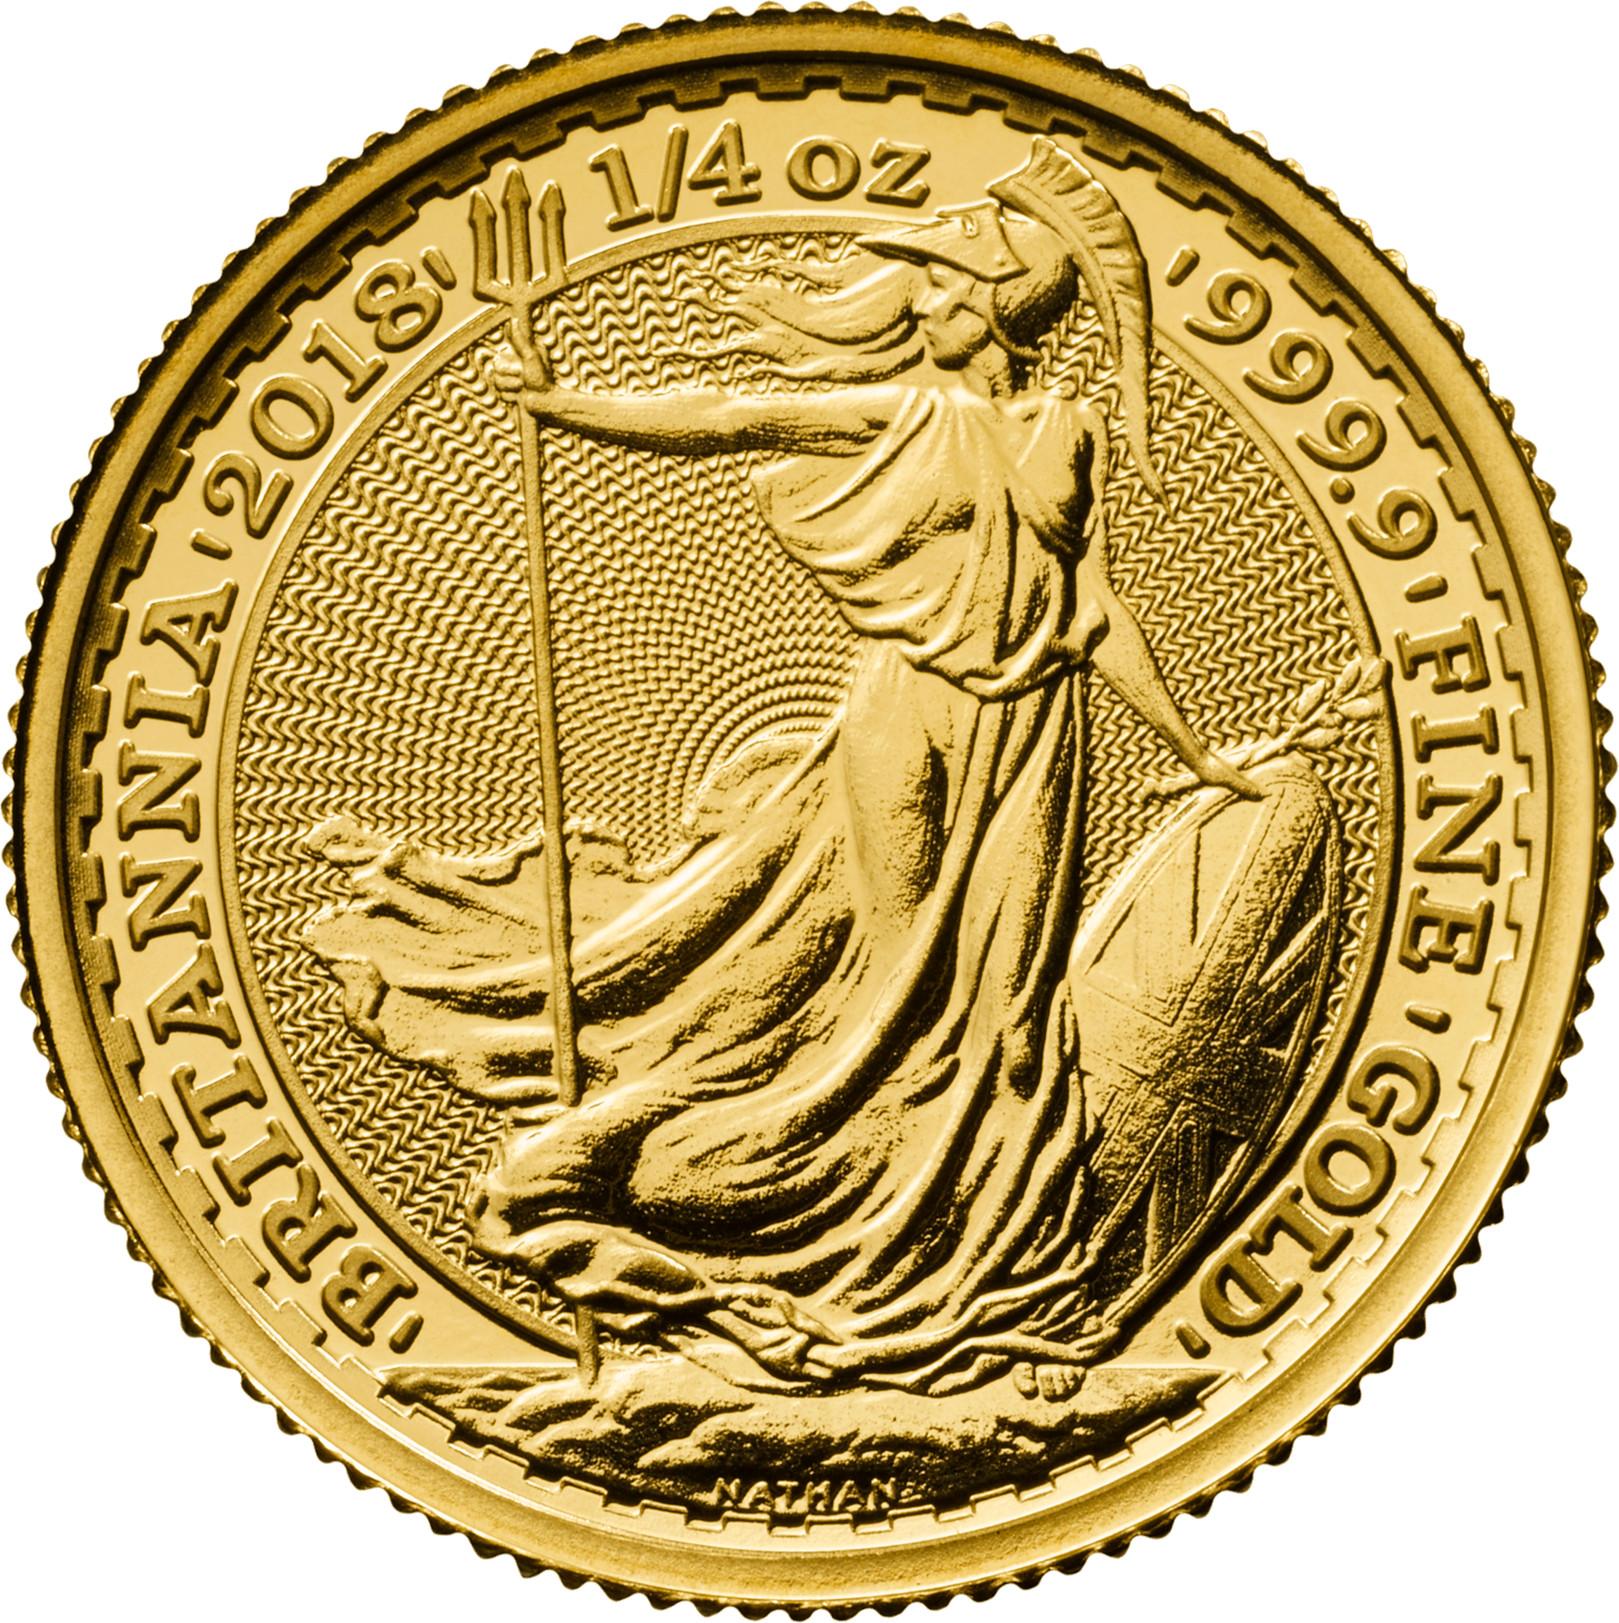 2018 Quarter Ounce Britannia Gold Coins 163 269